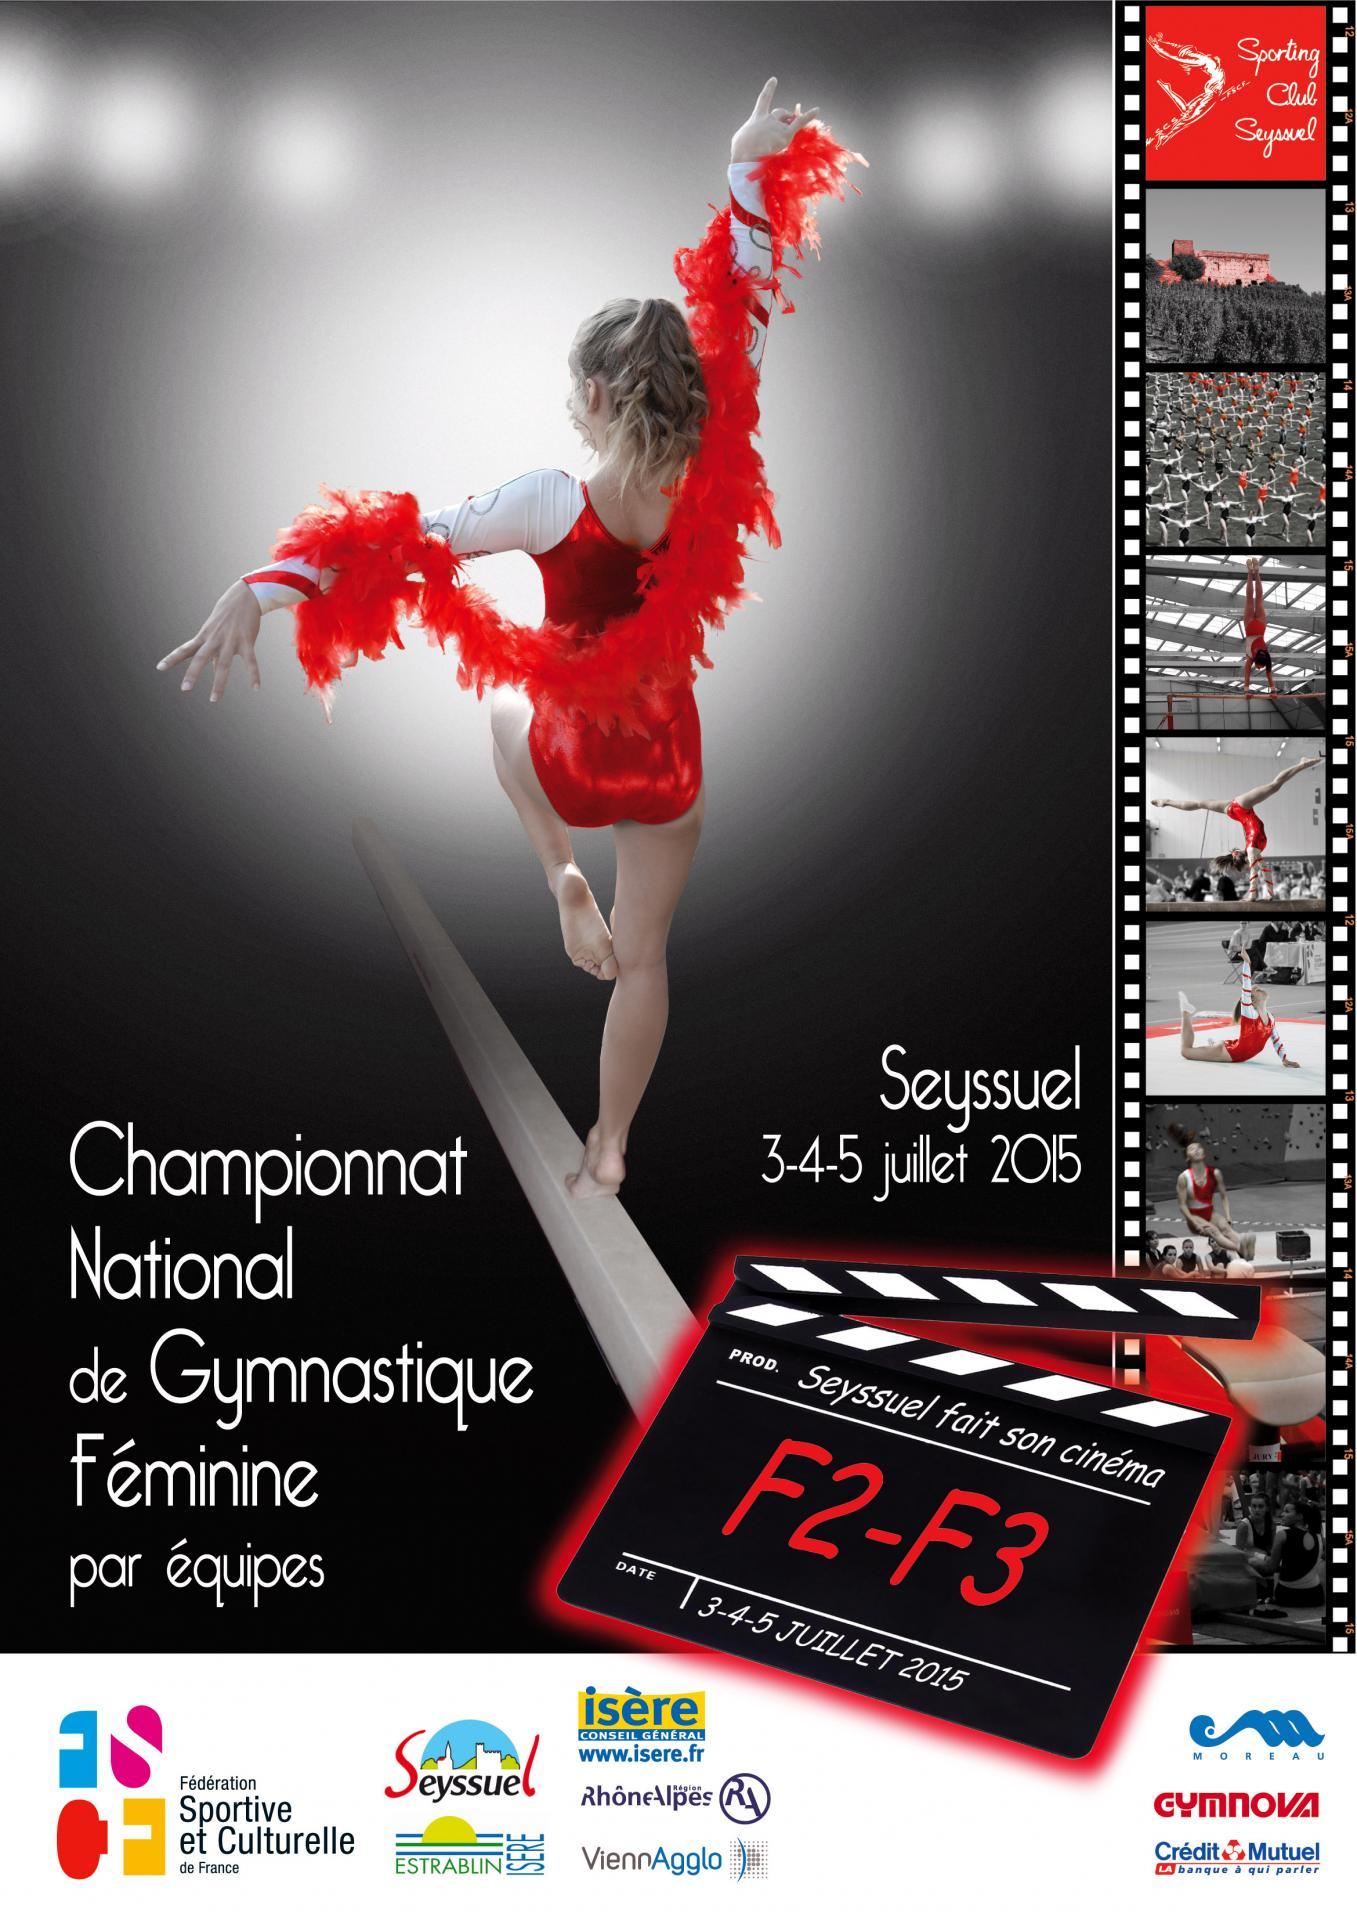 Championnat national de gymnastique feminine par equipes